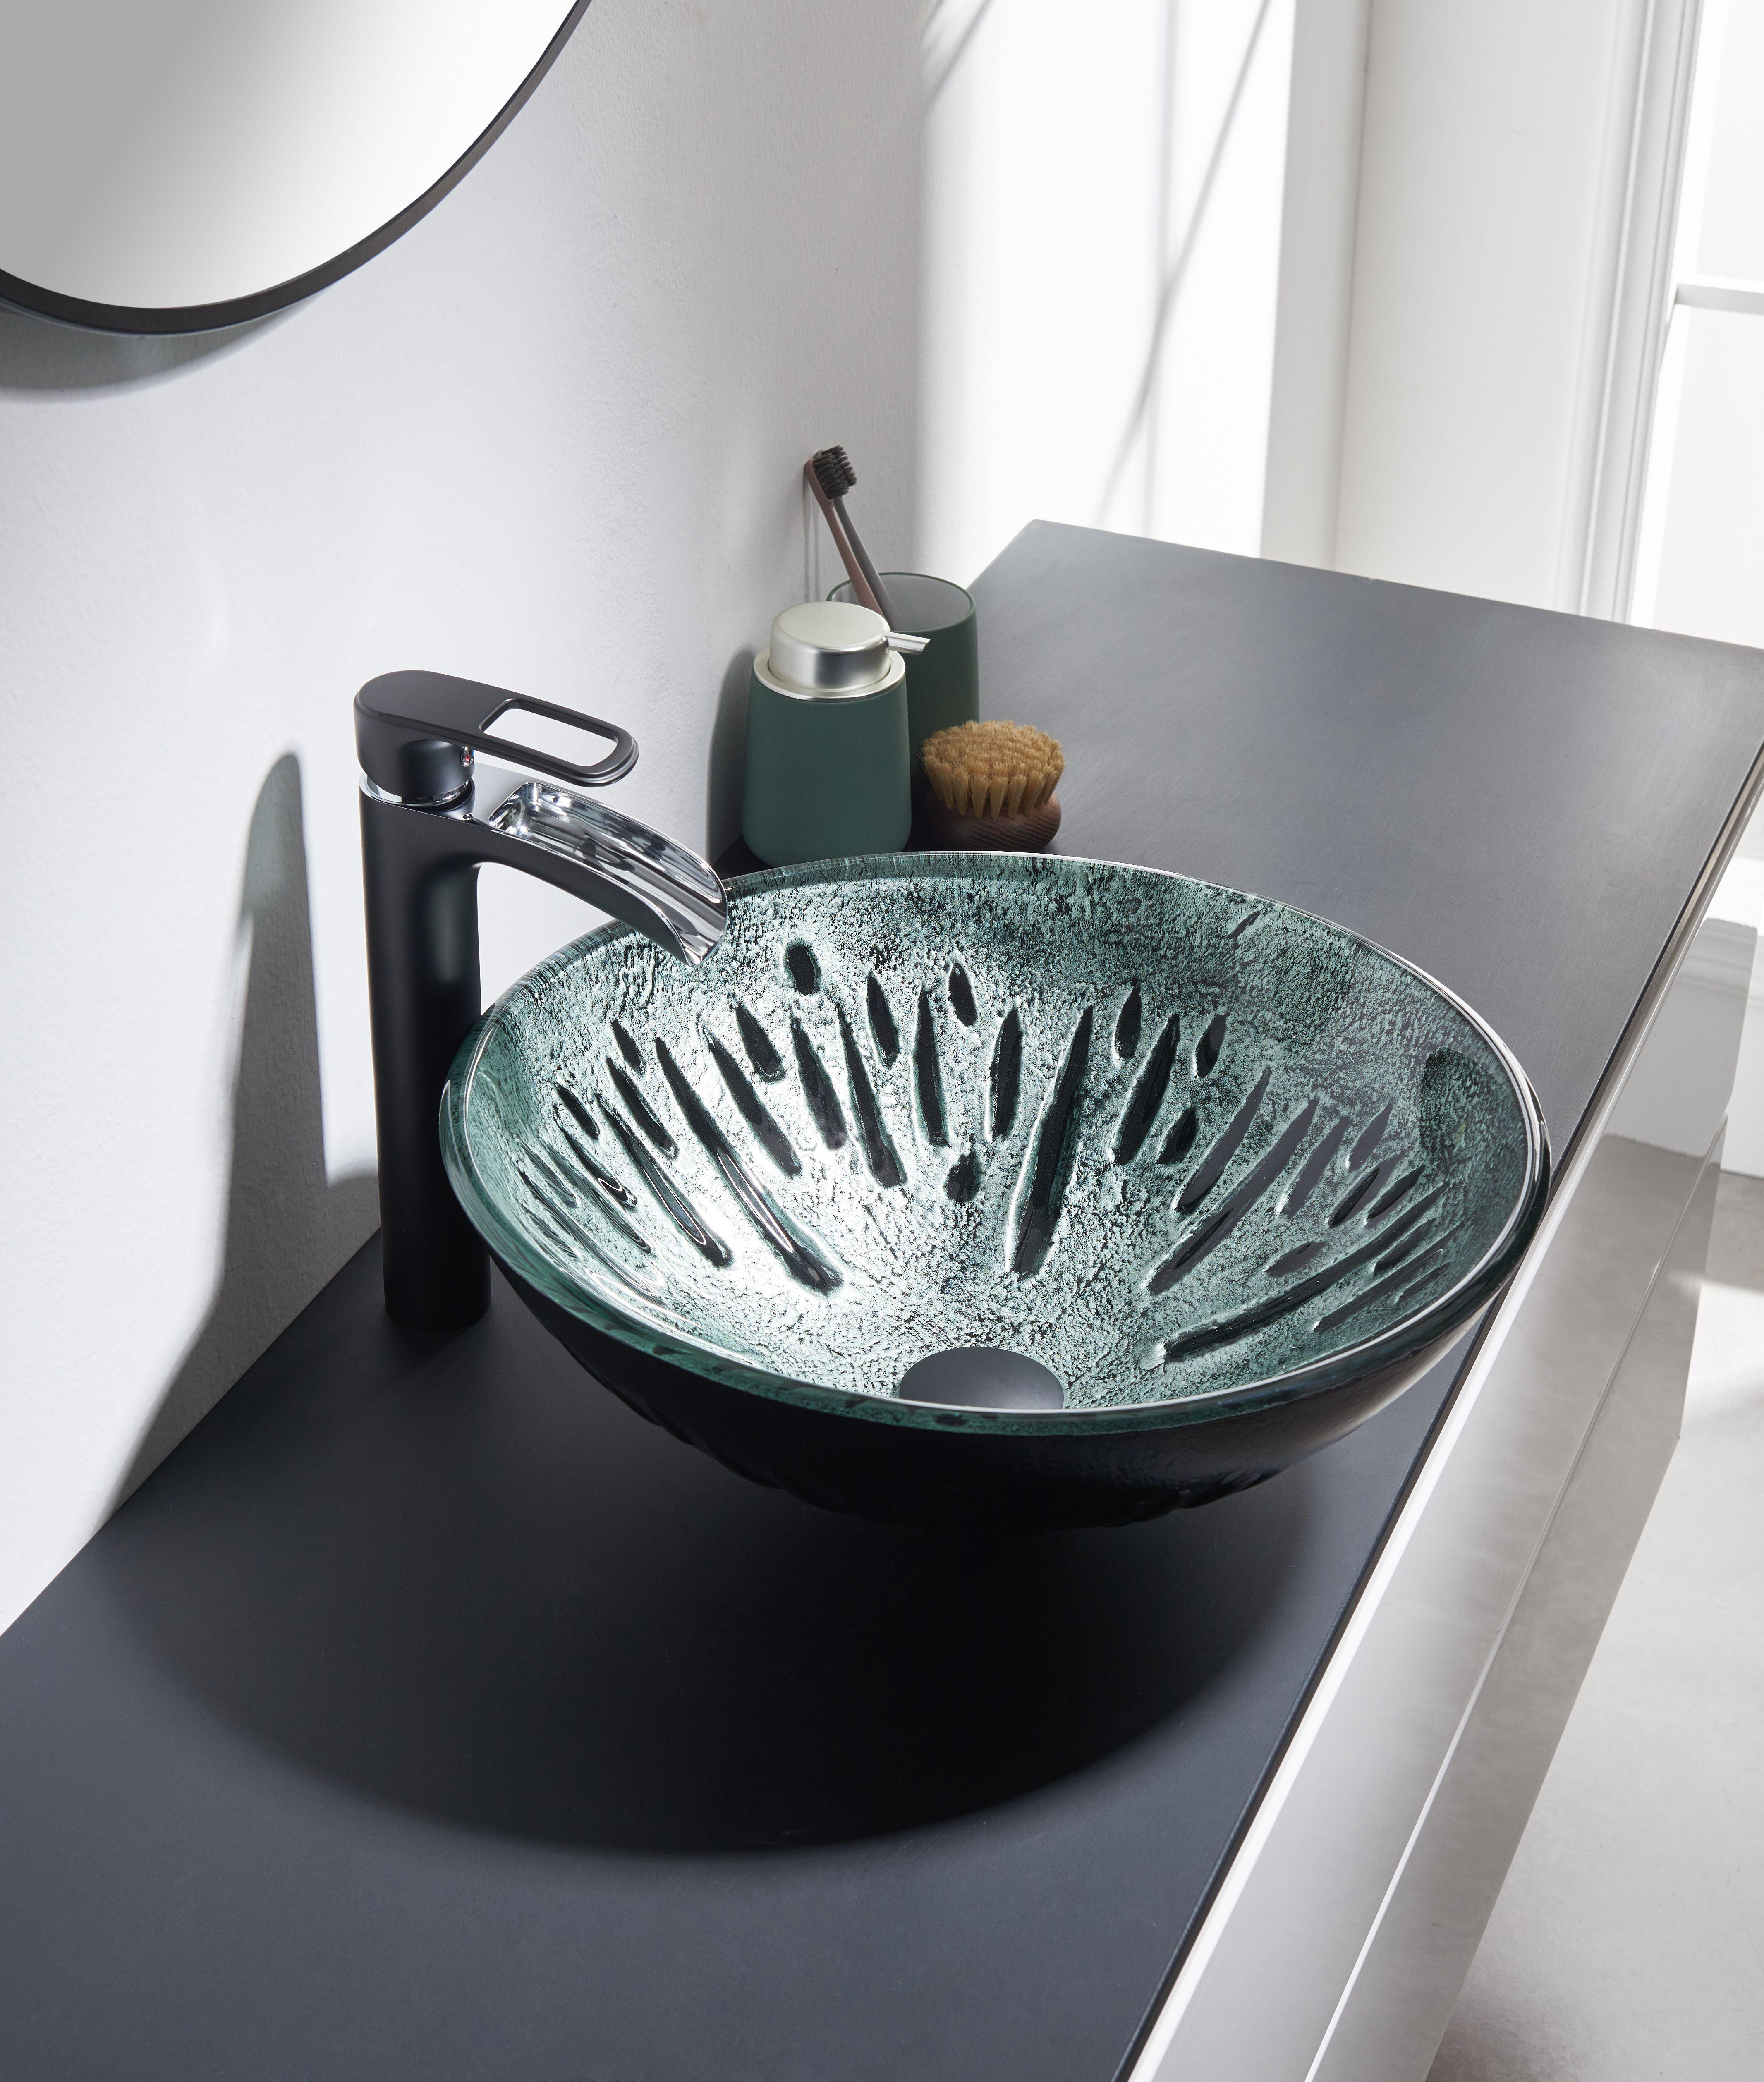 Dark Green Glass Handmade Circular Vessel Bathroom Sink In 2020 Sink Glass Vessel Sinks Green Glass